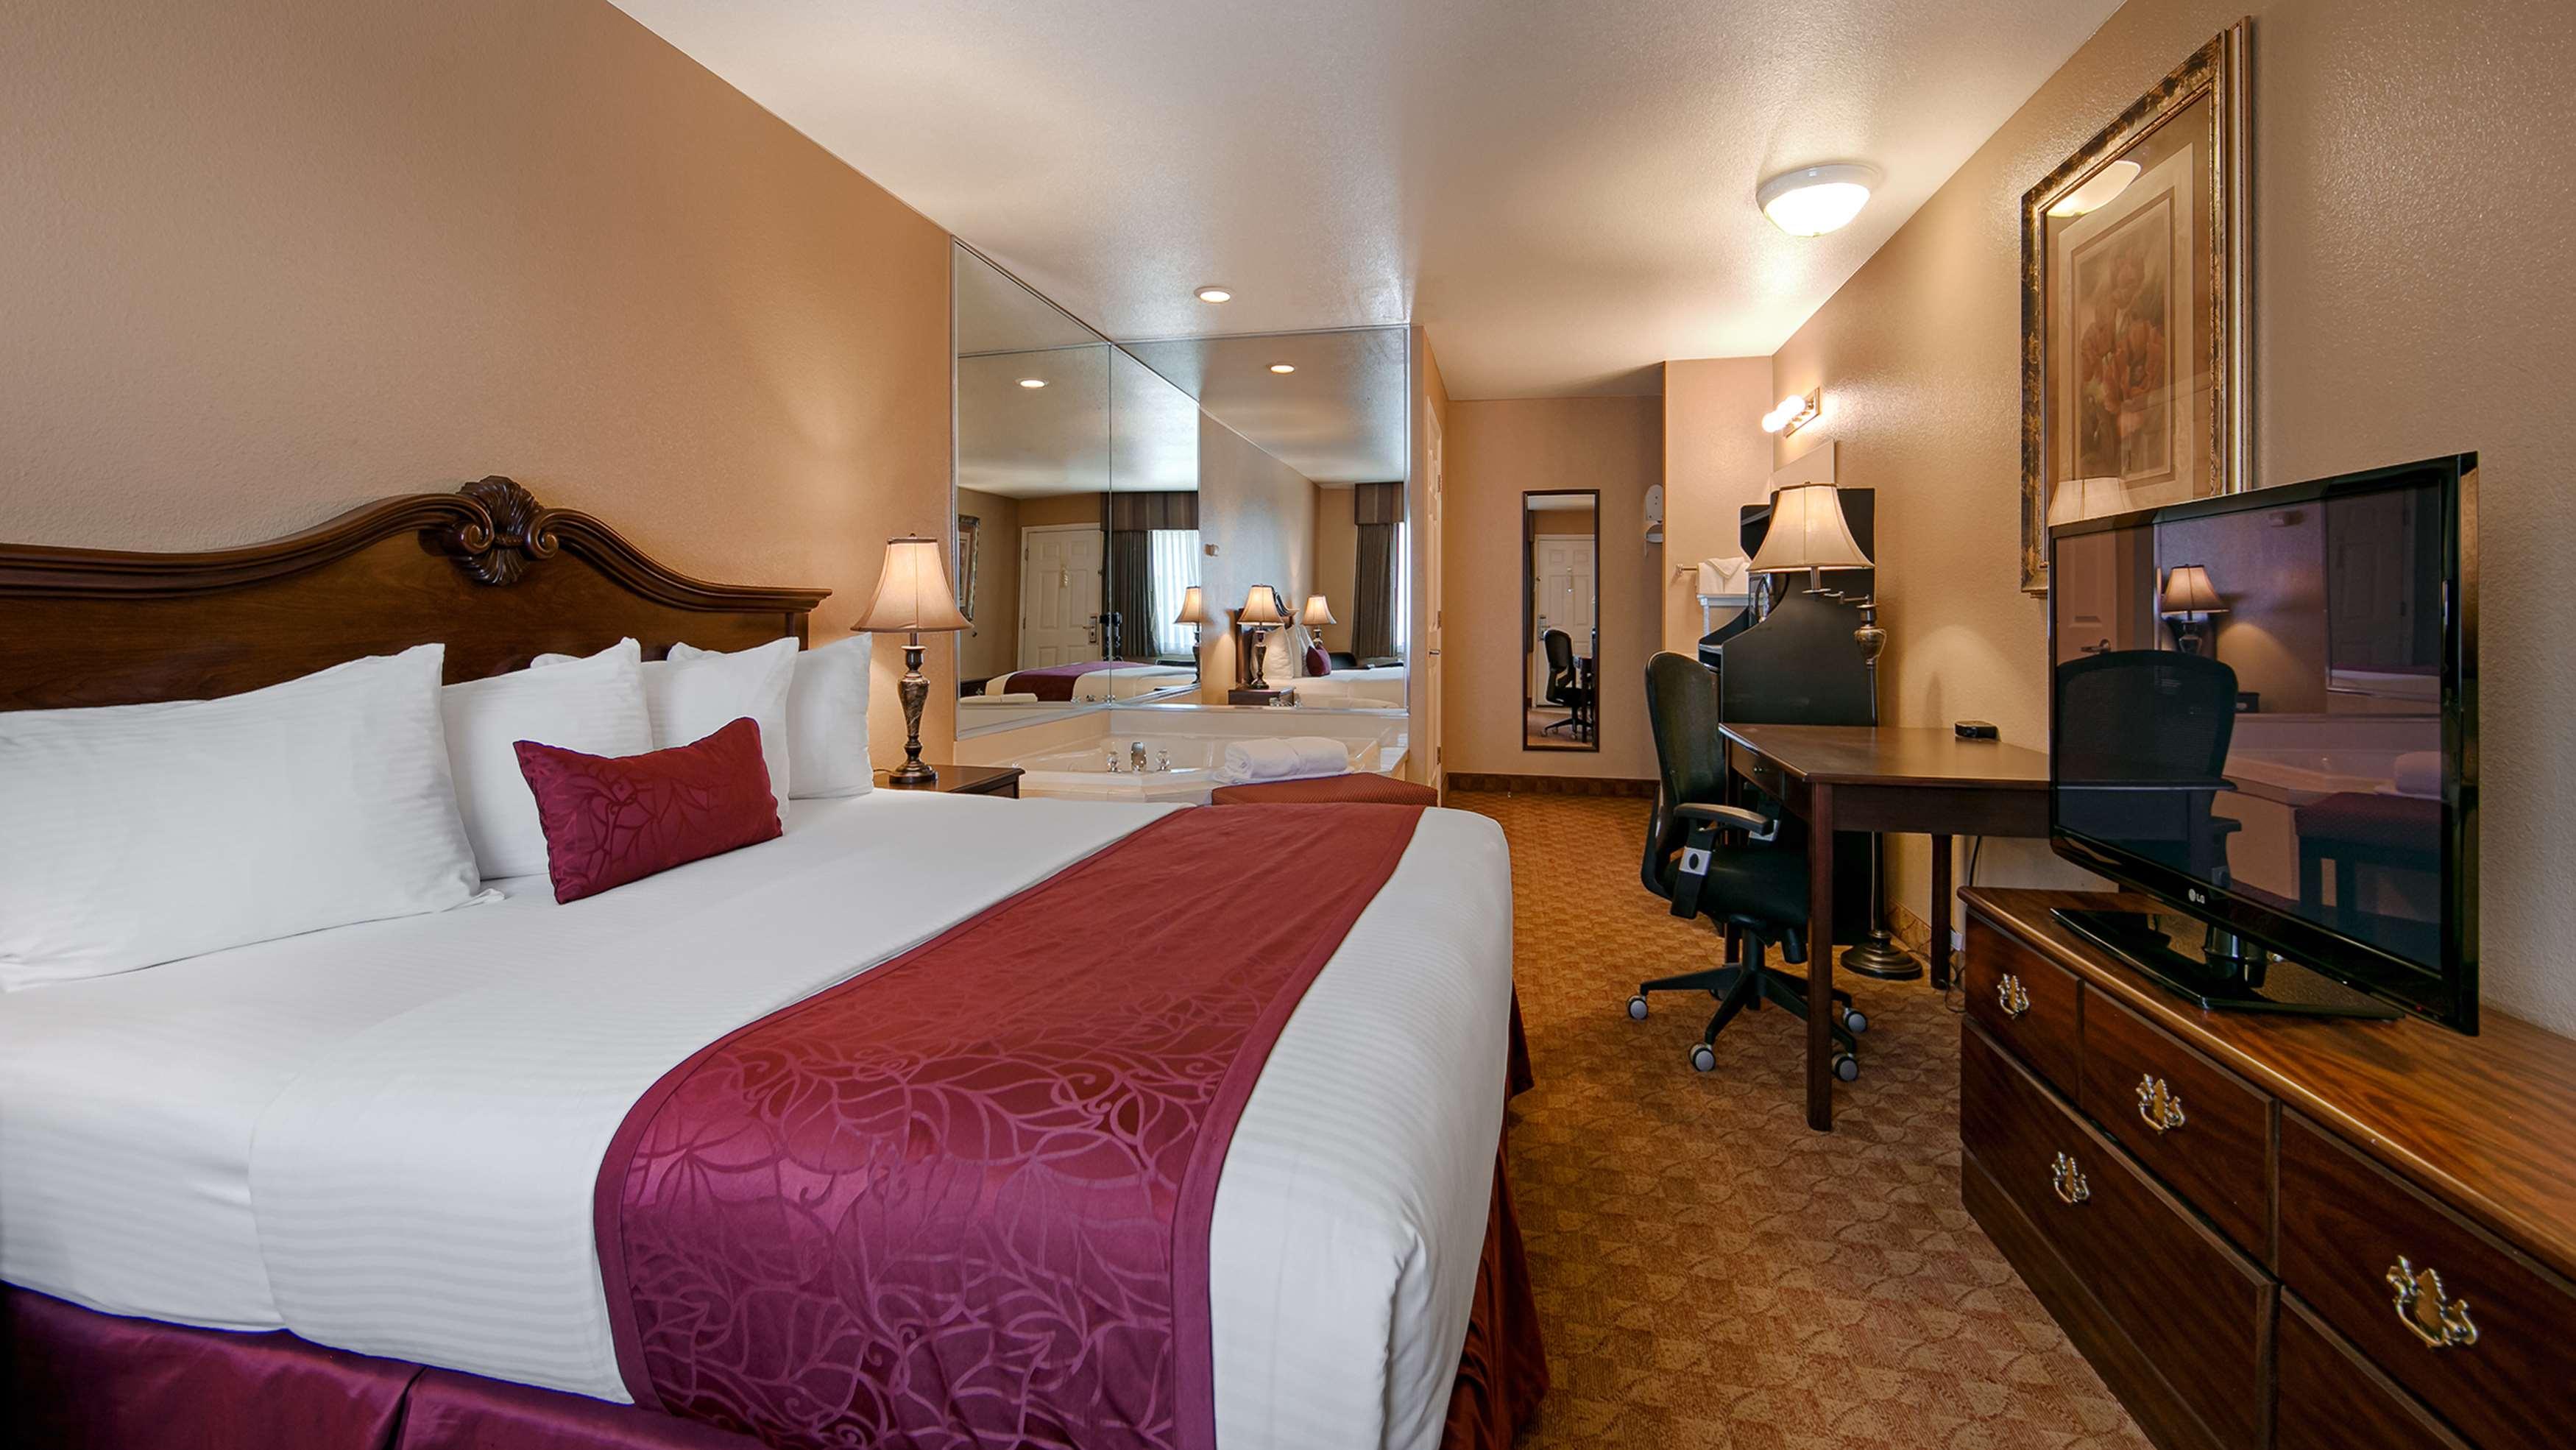 Best Western Fallon Inn & Suites image 10